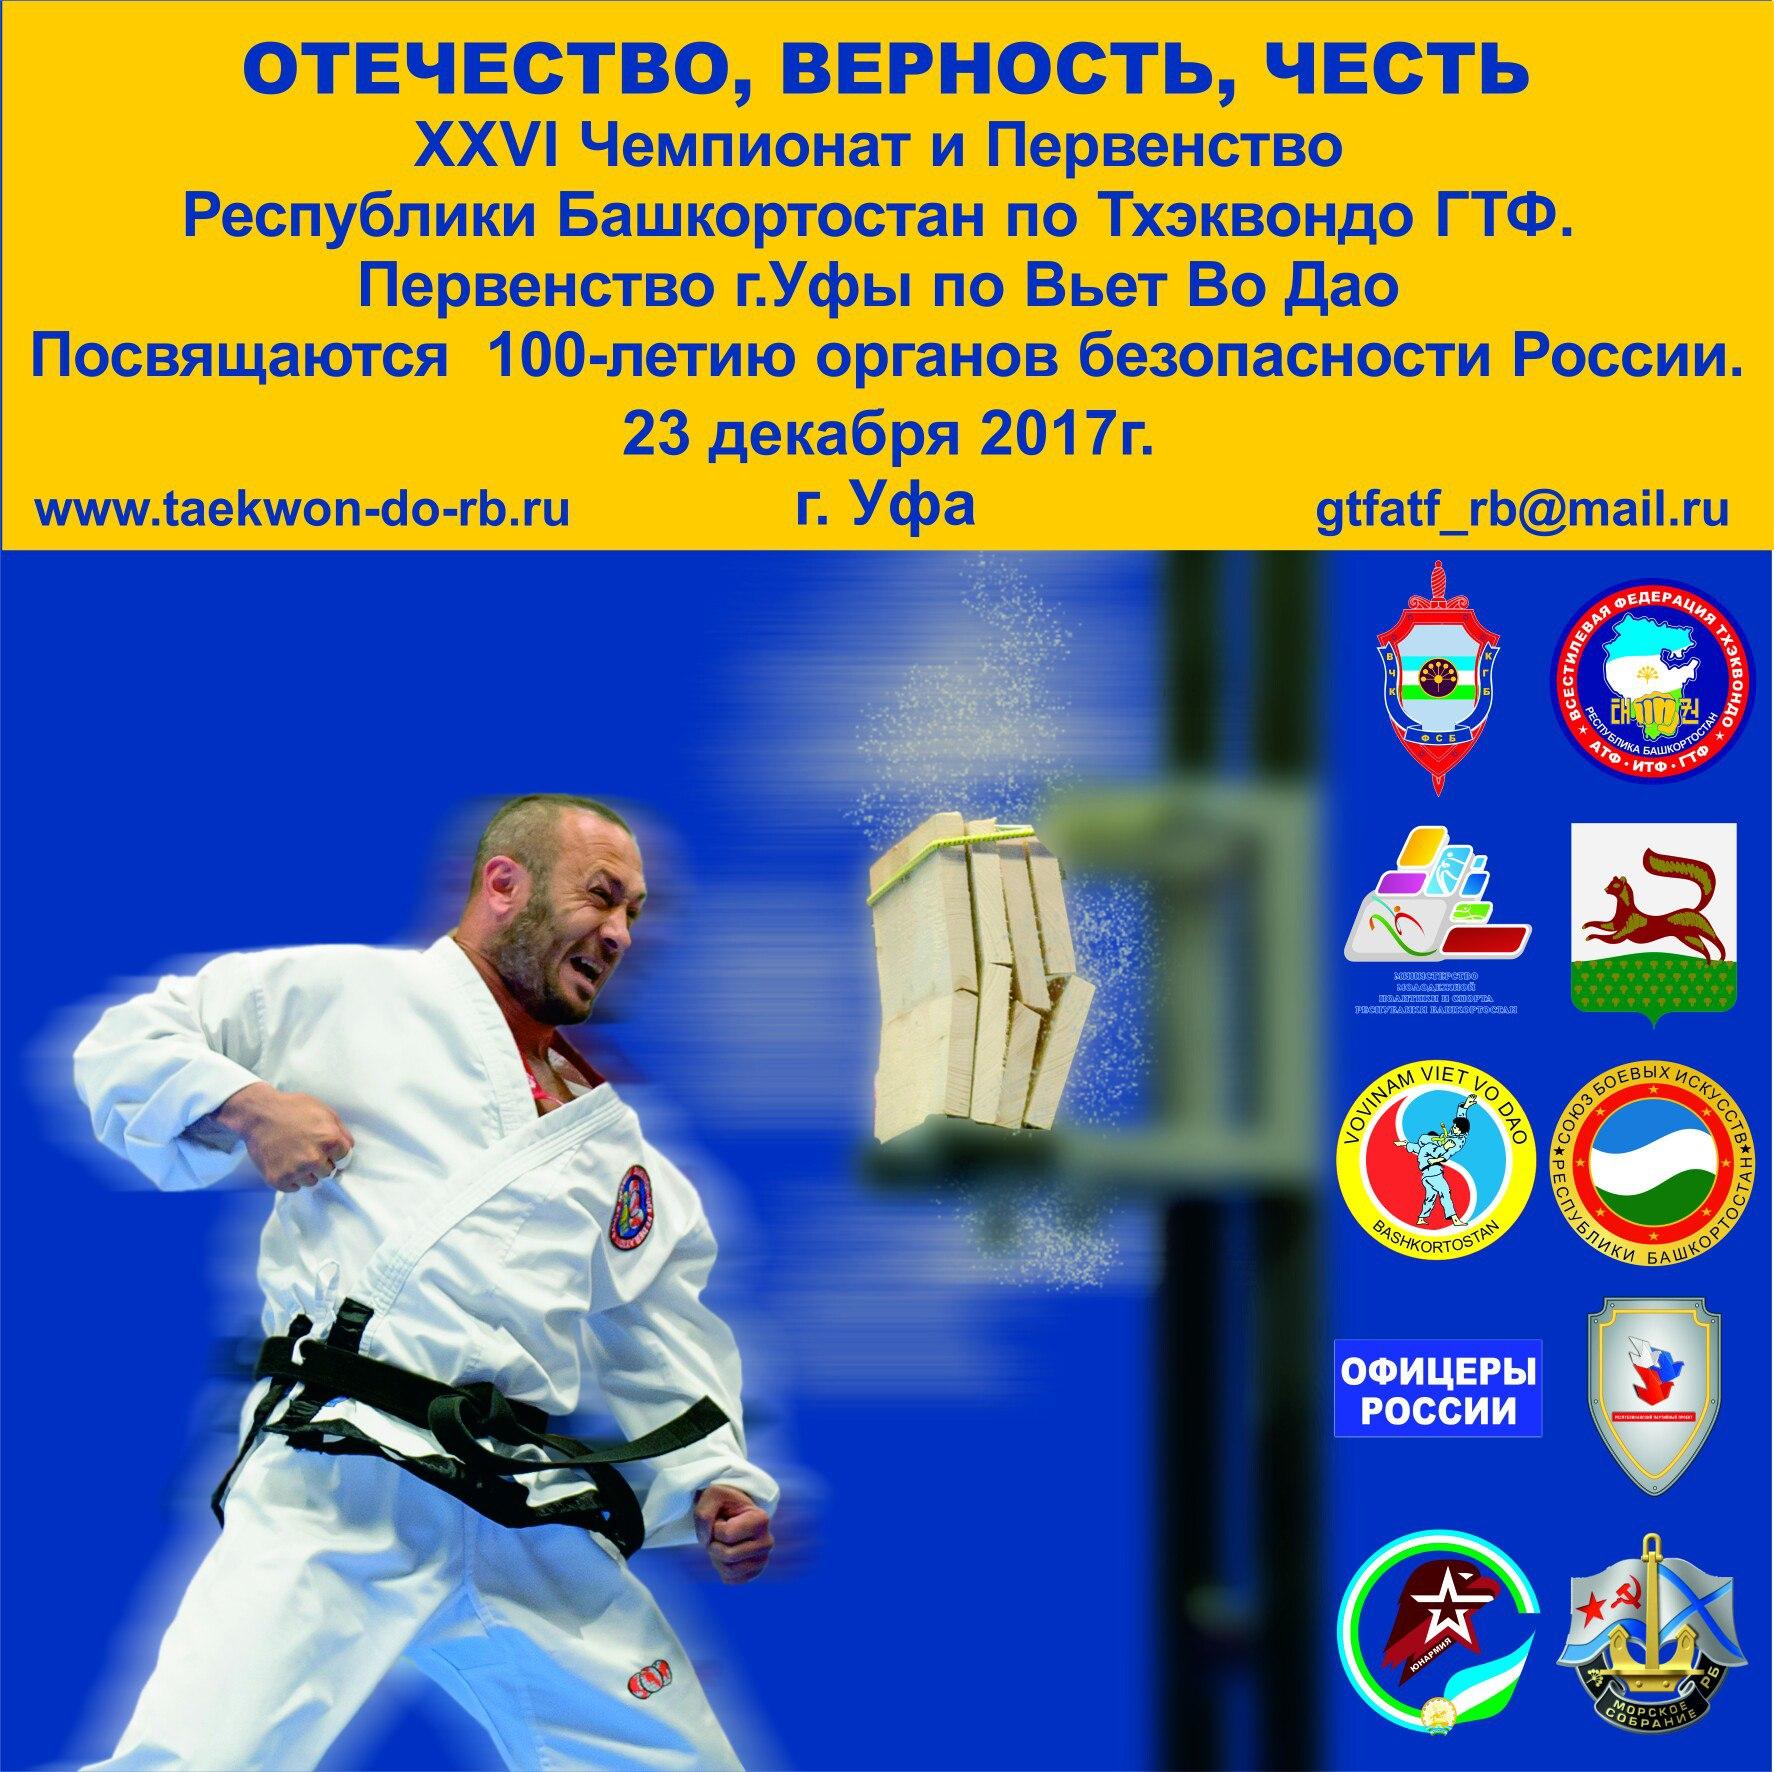 http://sbirb.combatsd.ru/images/upload/jH-zvsd3vkc.jpg